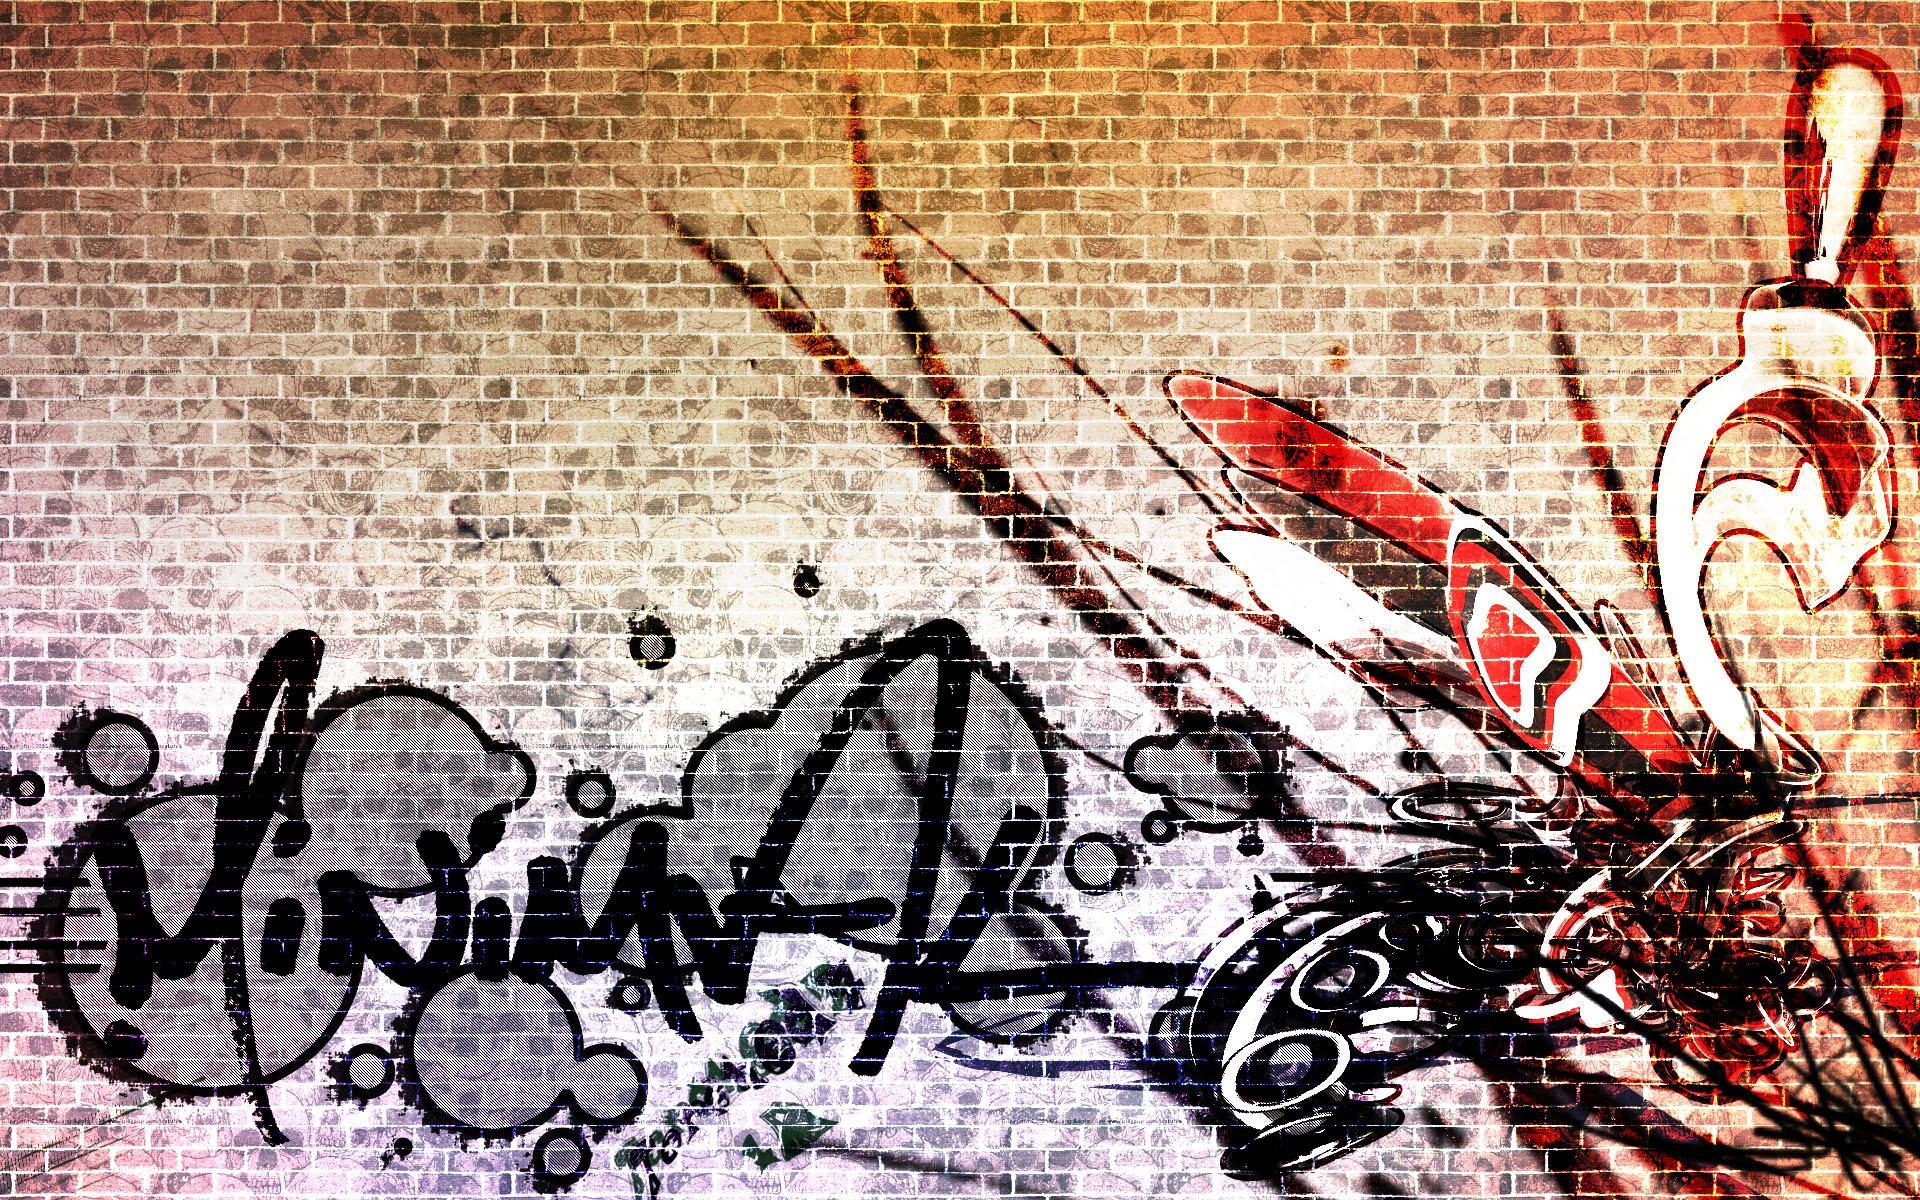 1920x1280 Graffiti Hd Wallpaper The Train Street Art Cool Images Download Amazing Artwork Background Wallpapers Desktop Mac